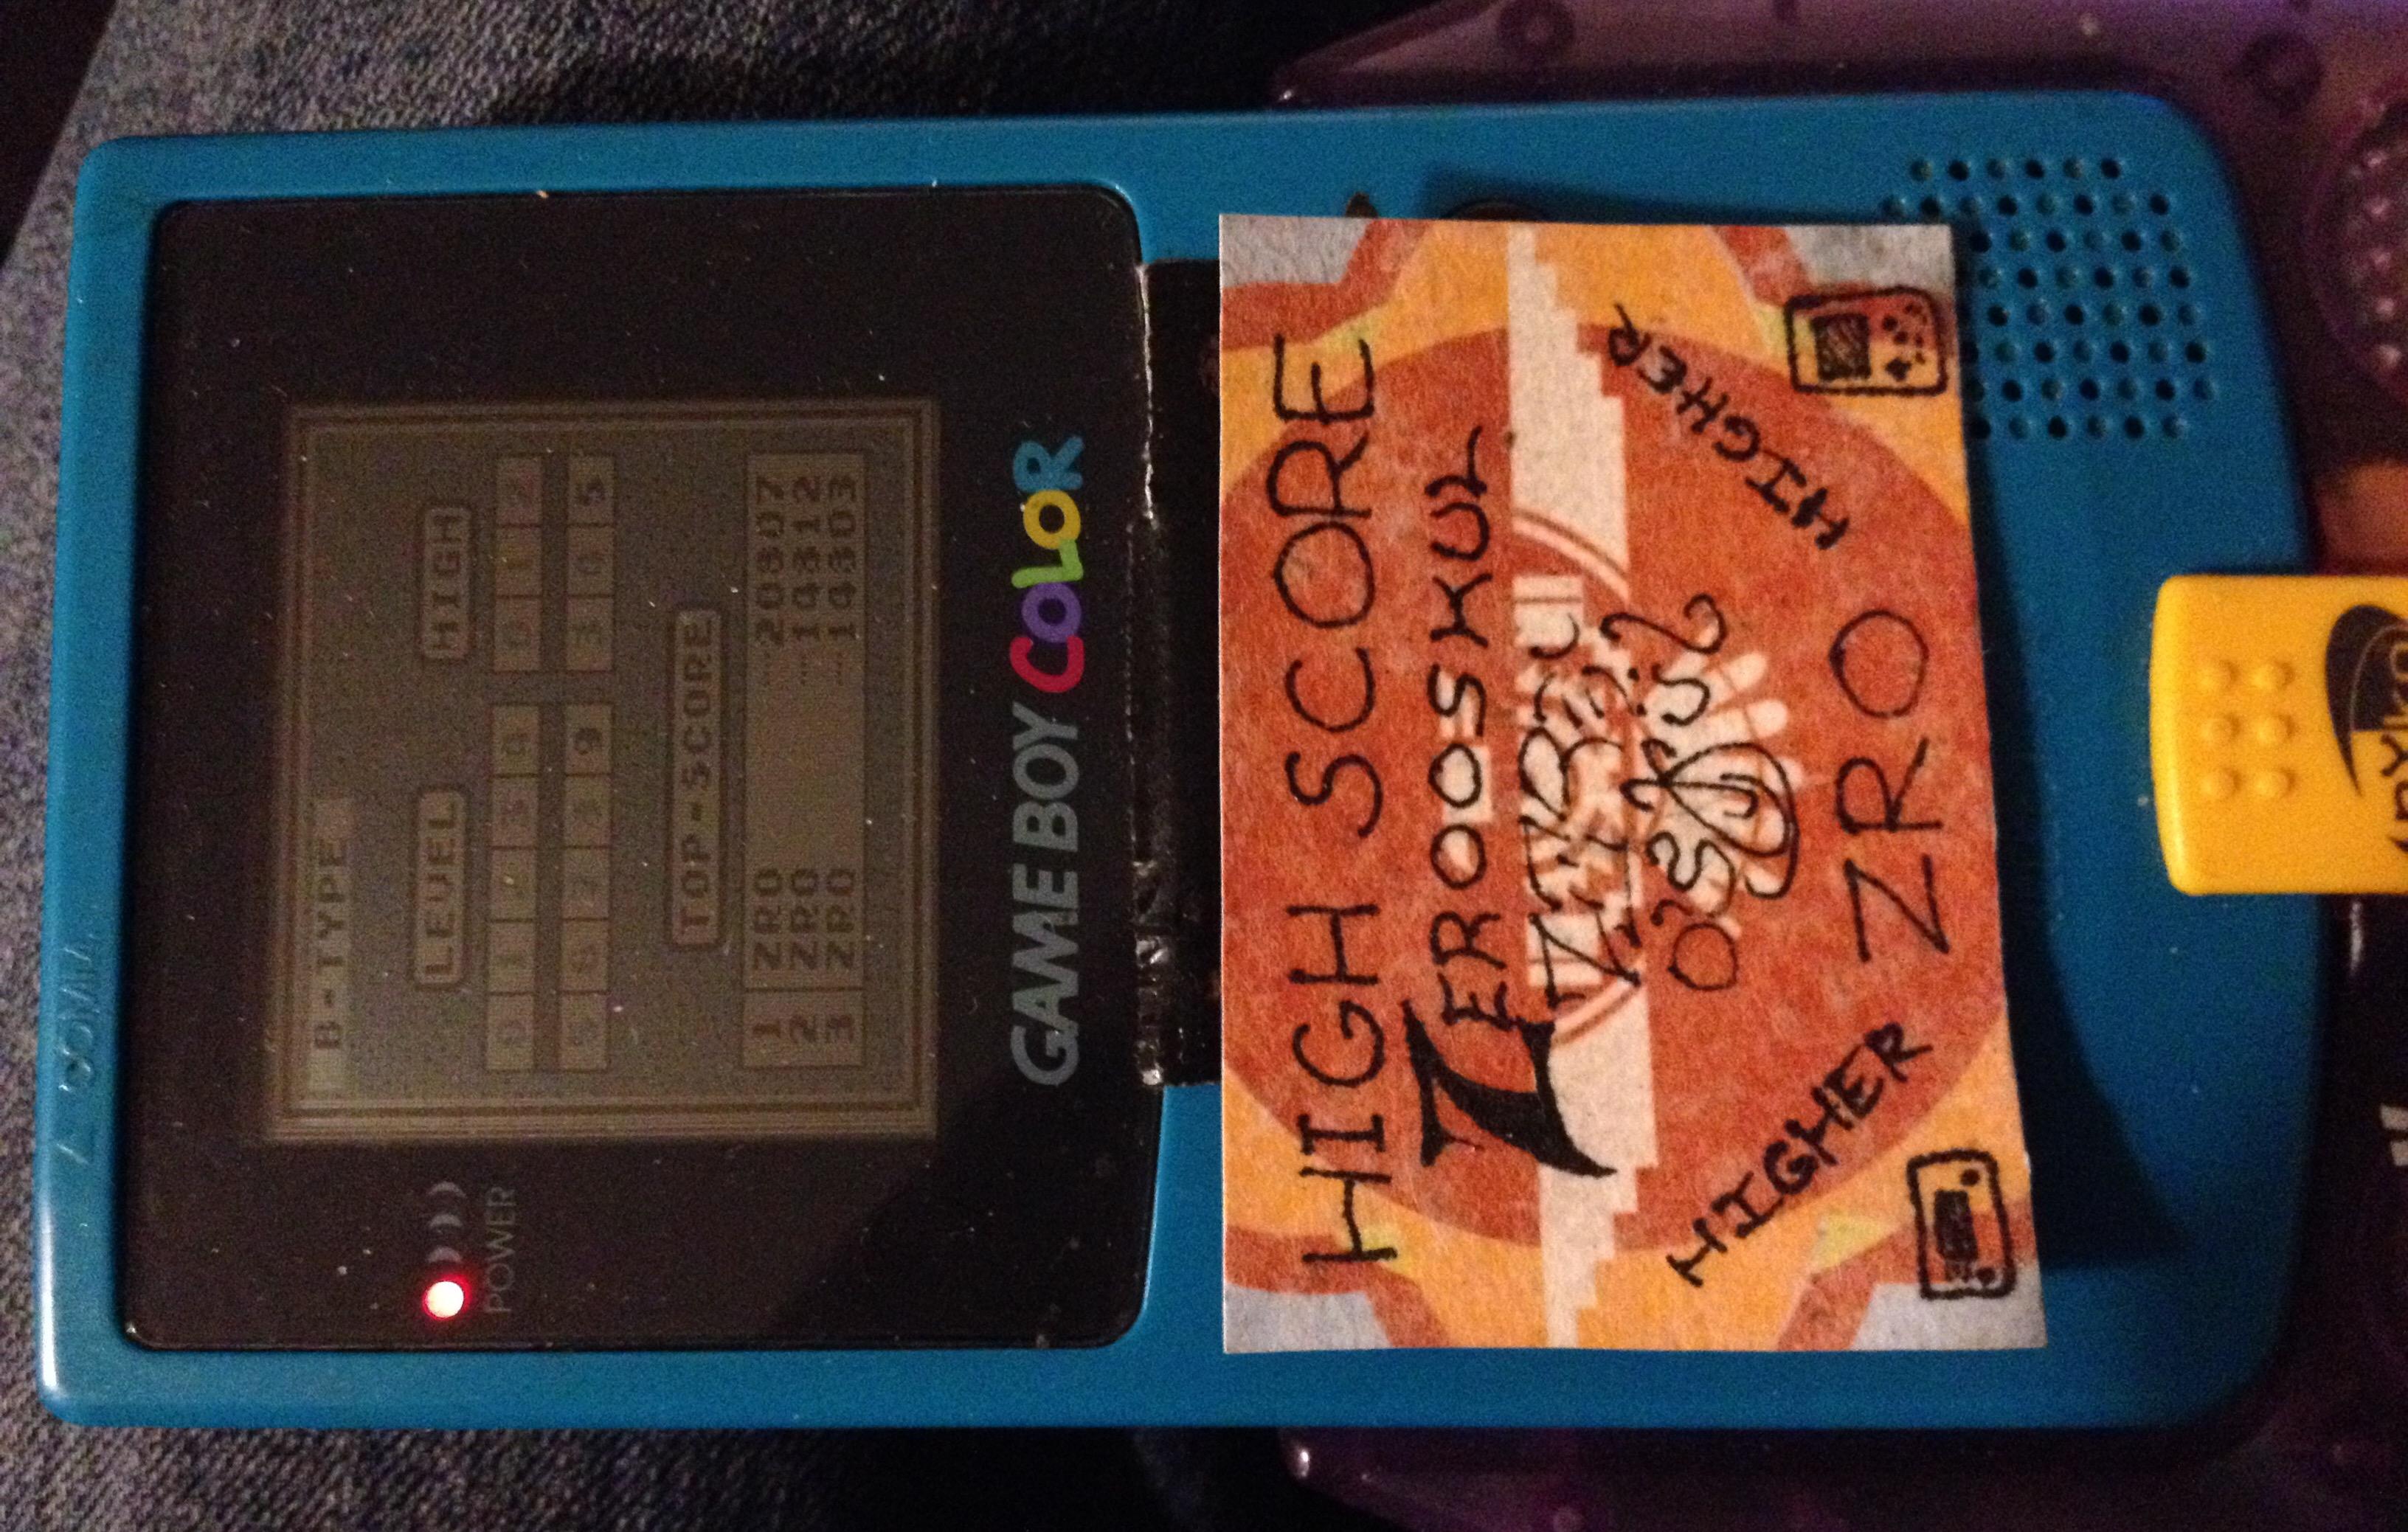 zerooskul: Tetris: Type B [Level 9 / High 5] (Game Boy) 20,807 points on 2019-11-11 14:13:41